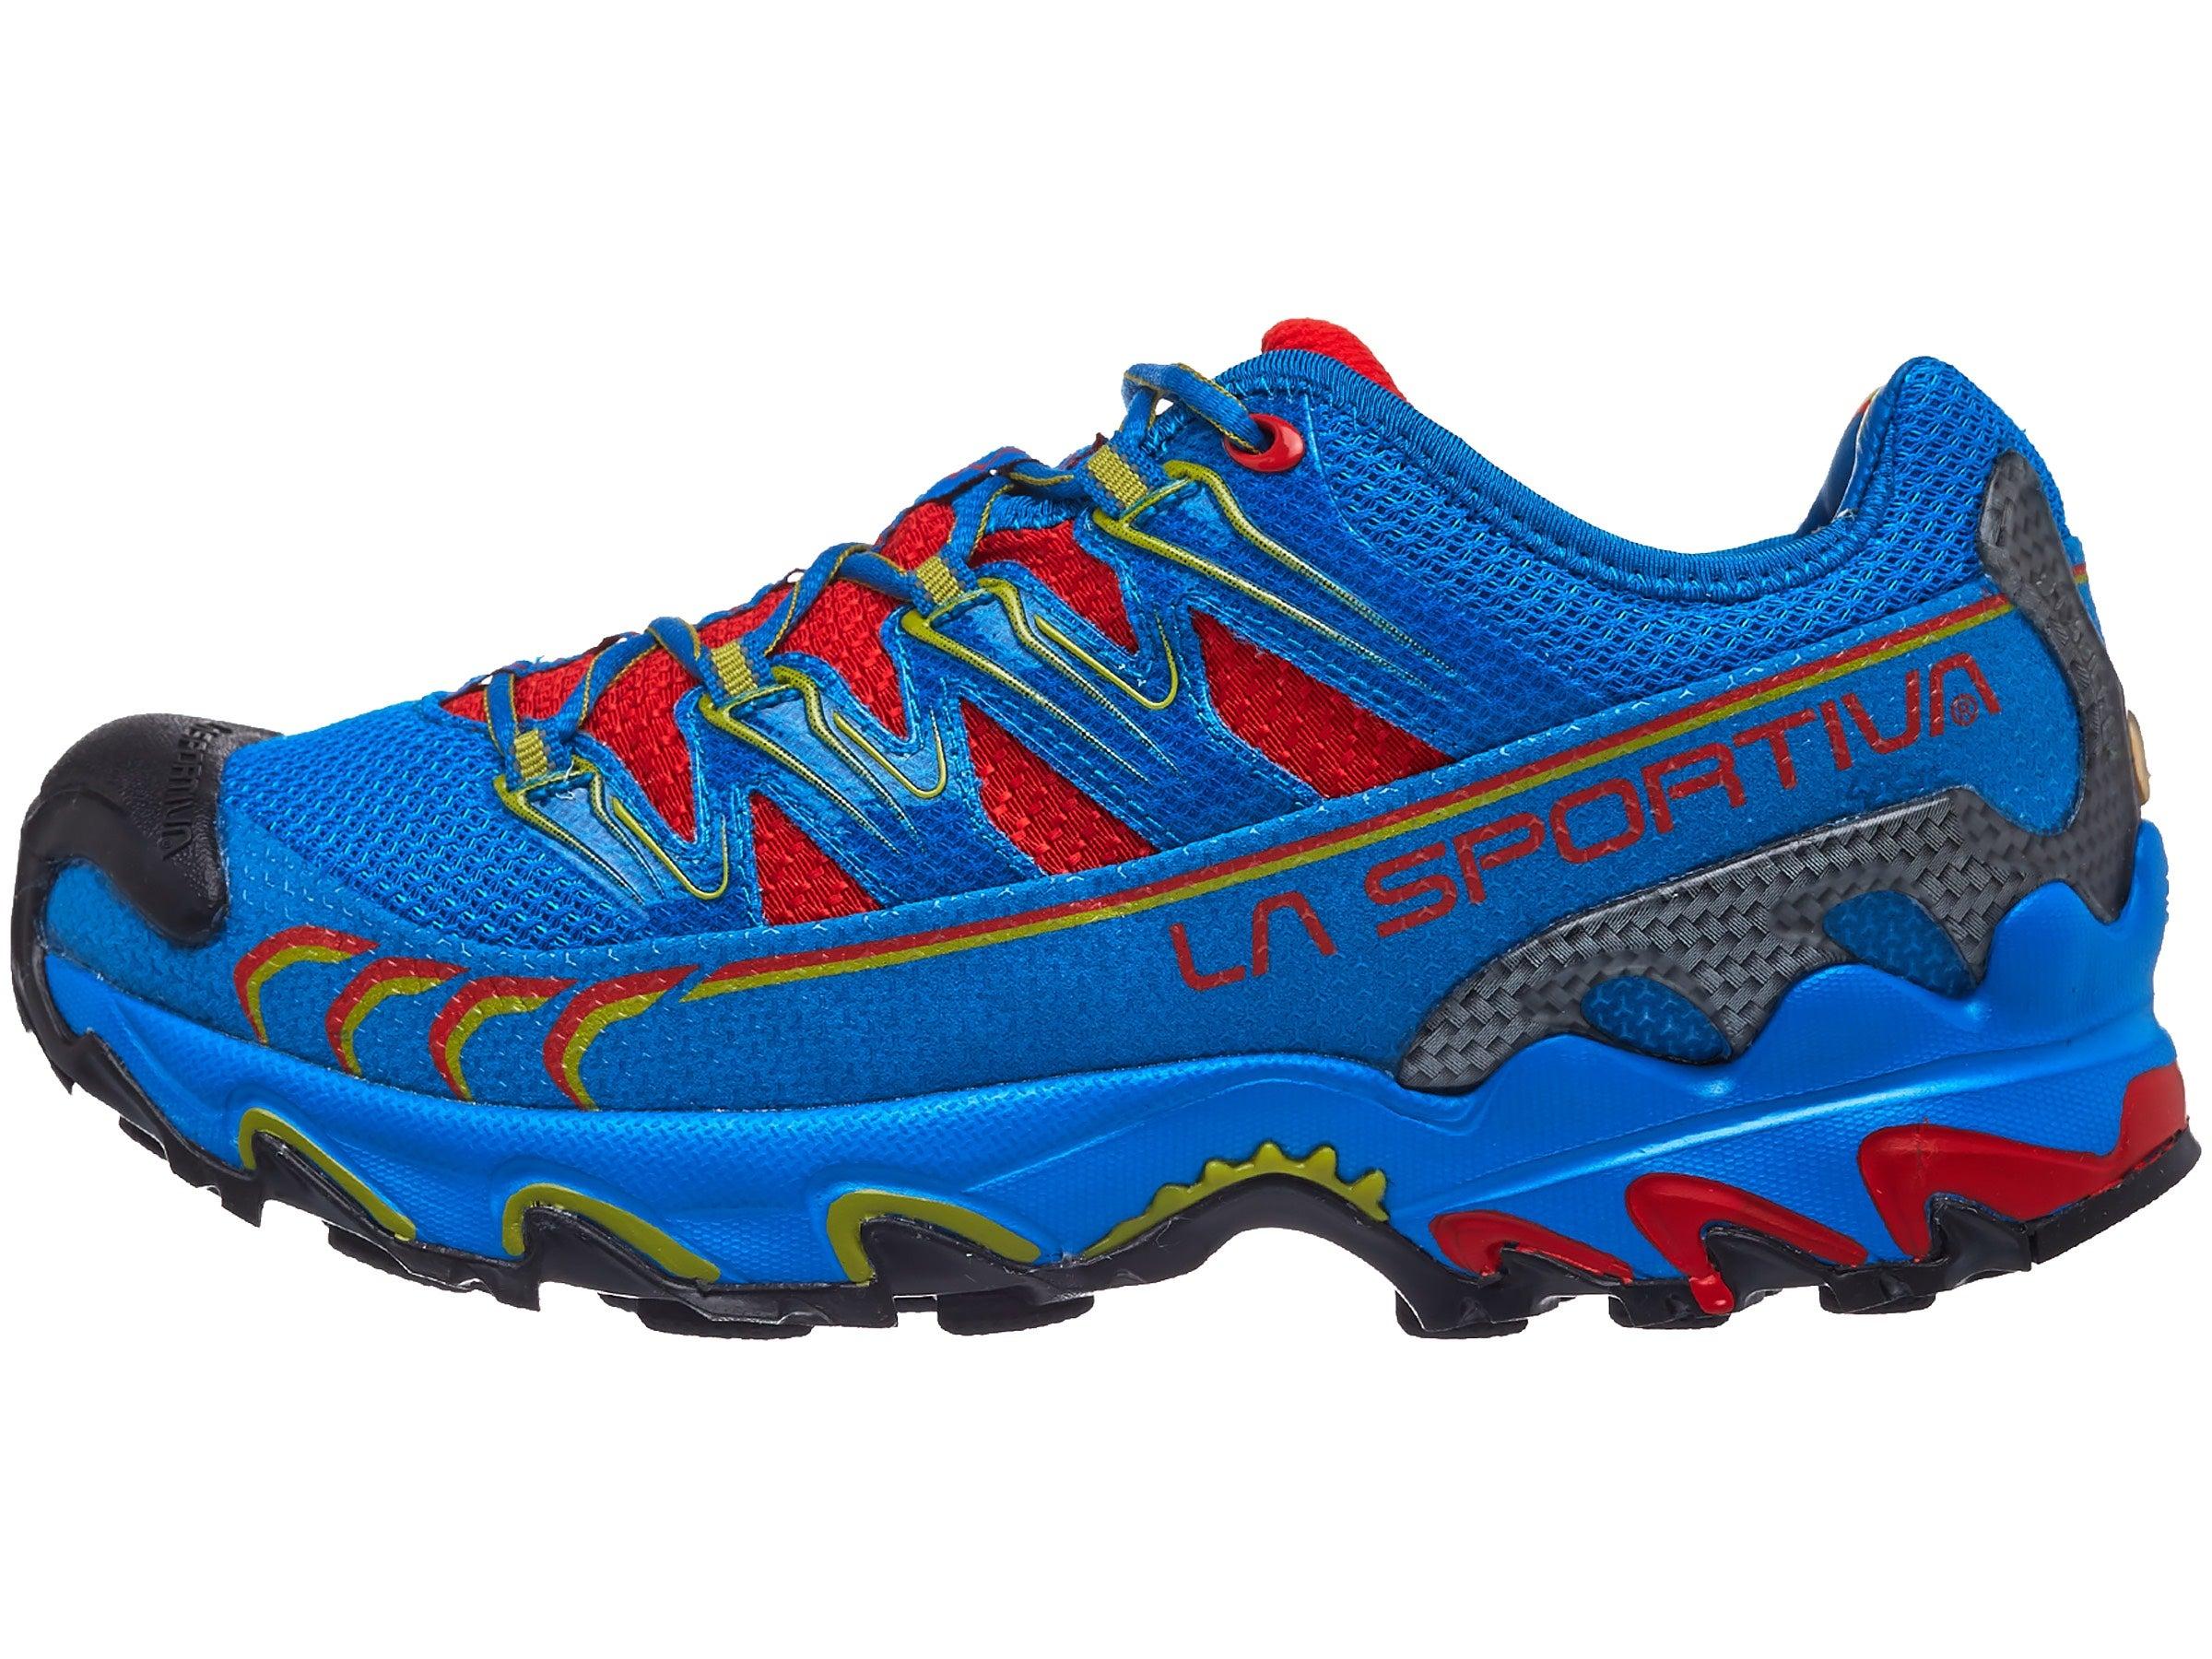 La Sportiva Ultra Raptor Men's Shoes Neptune/Poppy